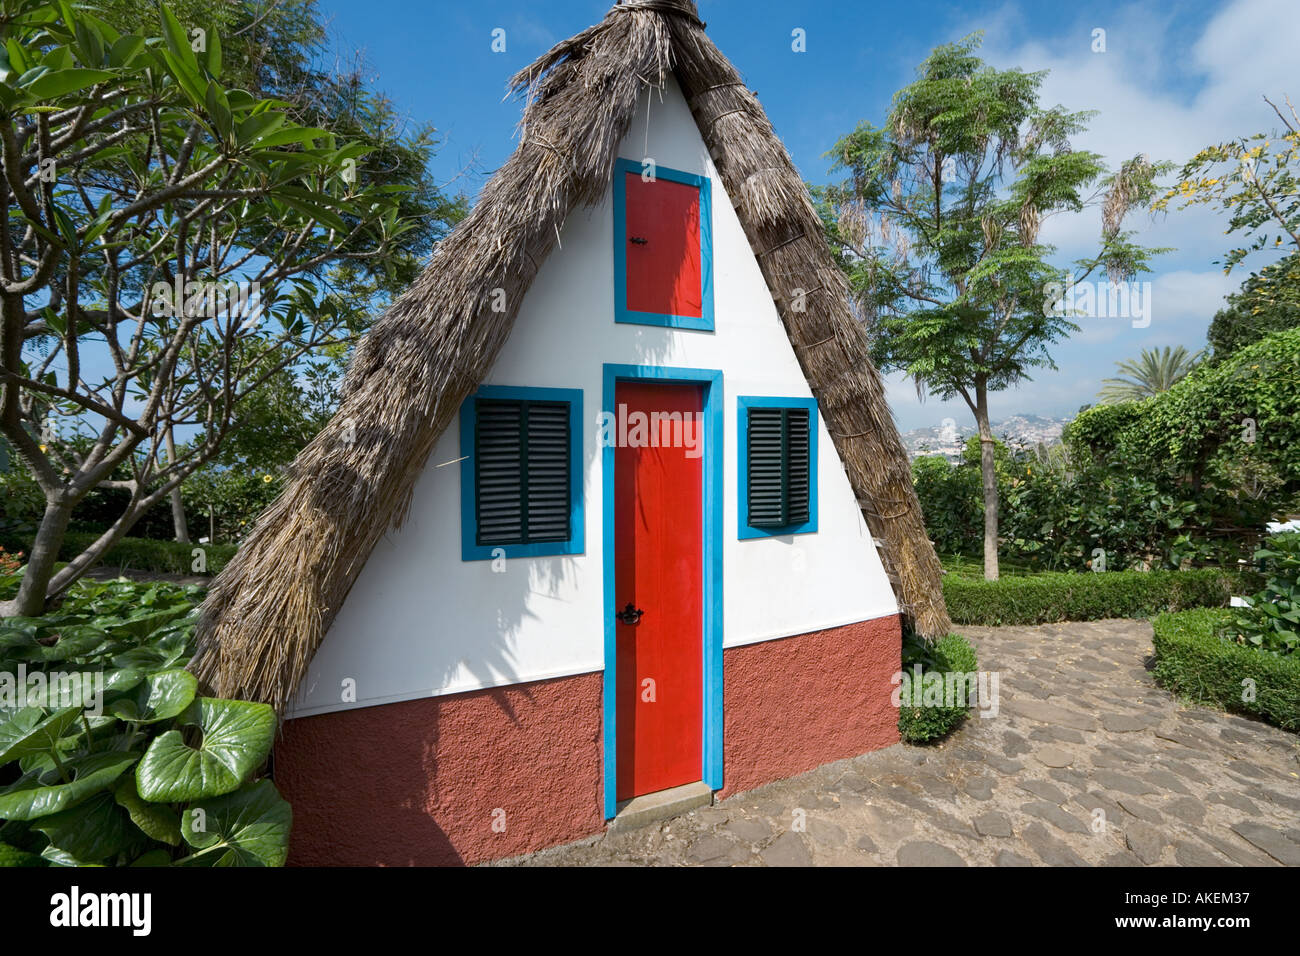 Santana-Style House, botanische Gärten, Funchal, Madeira, Portugal Stockbild